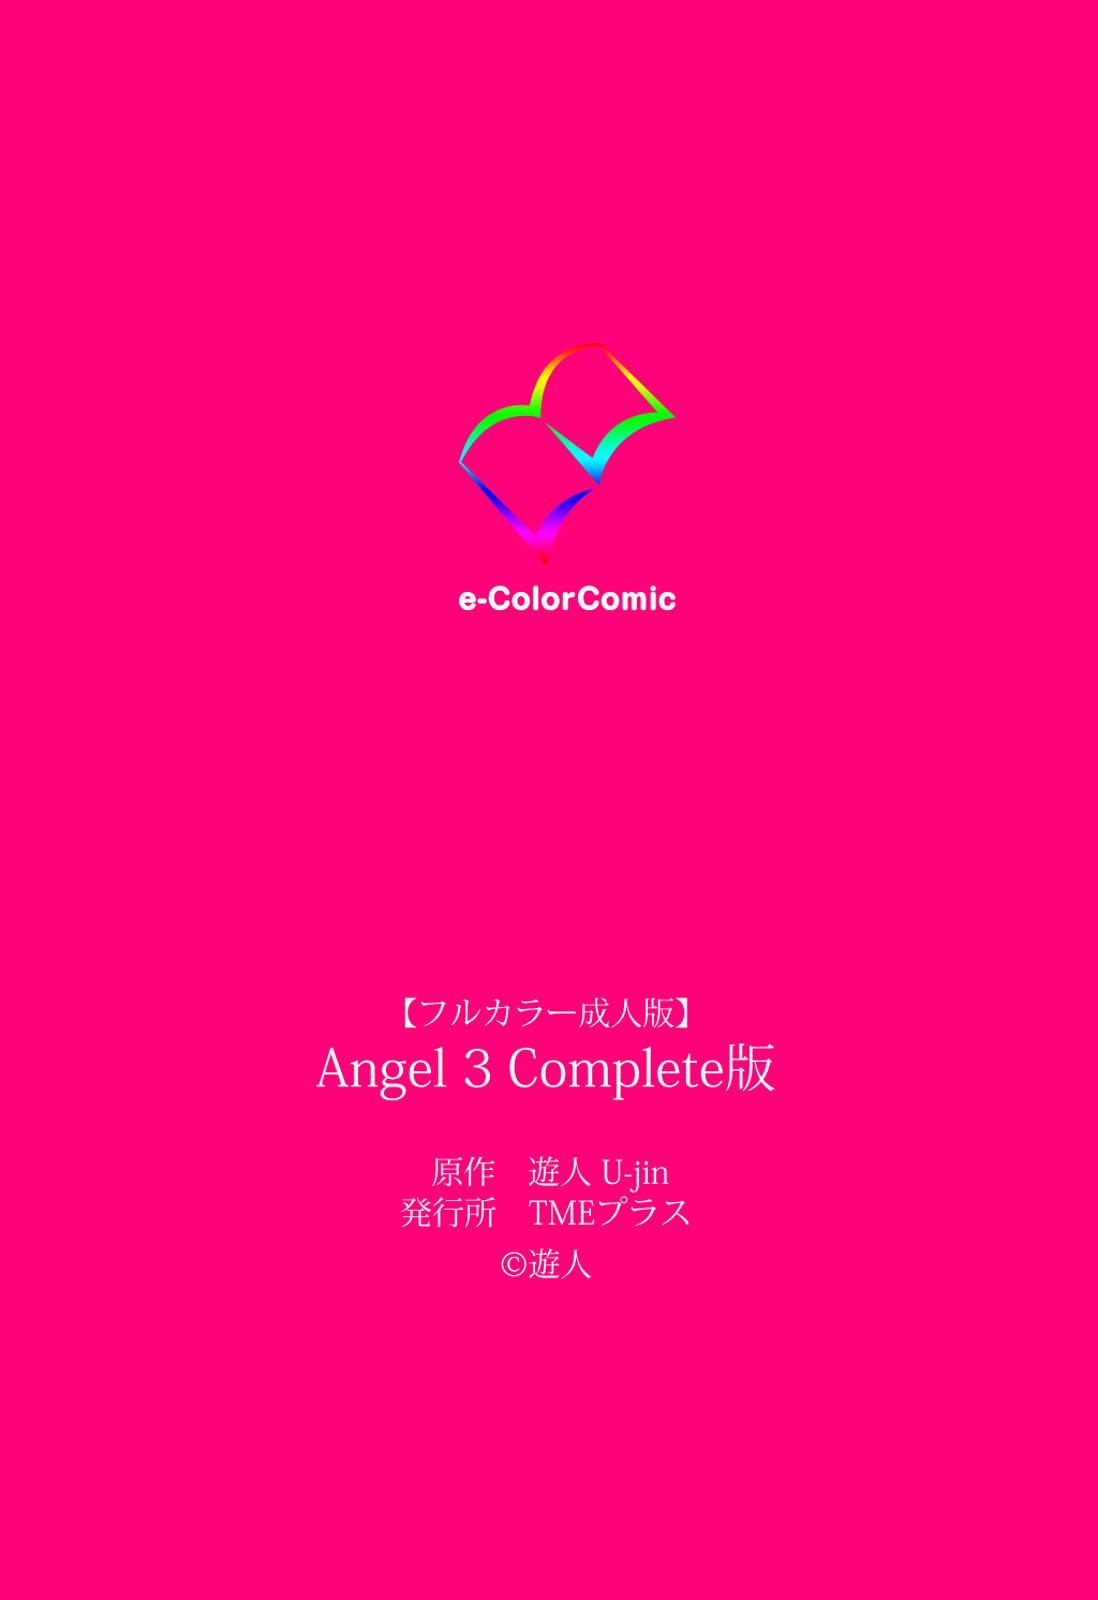 ANGEL 3 Completeban 198